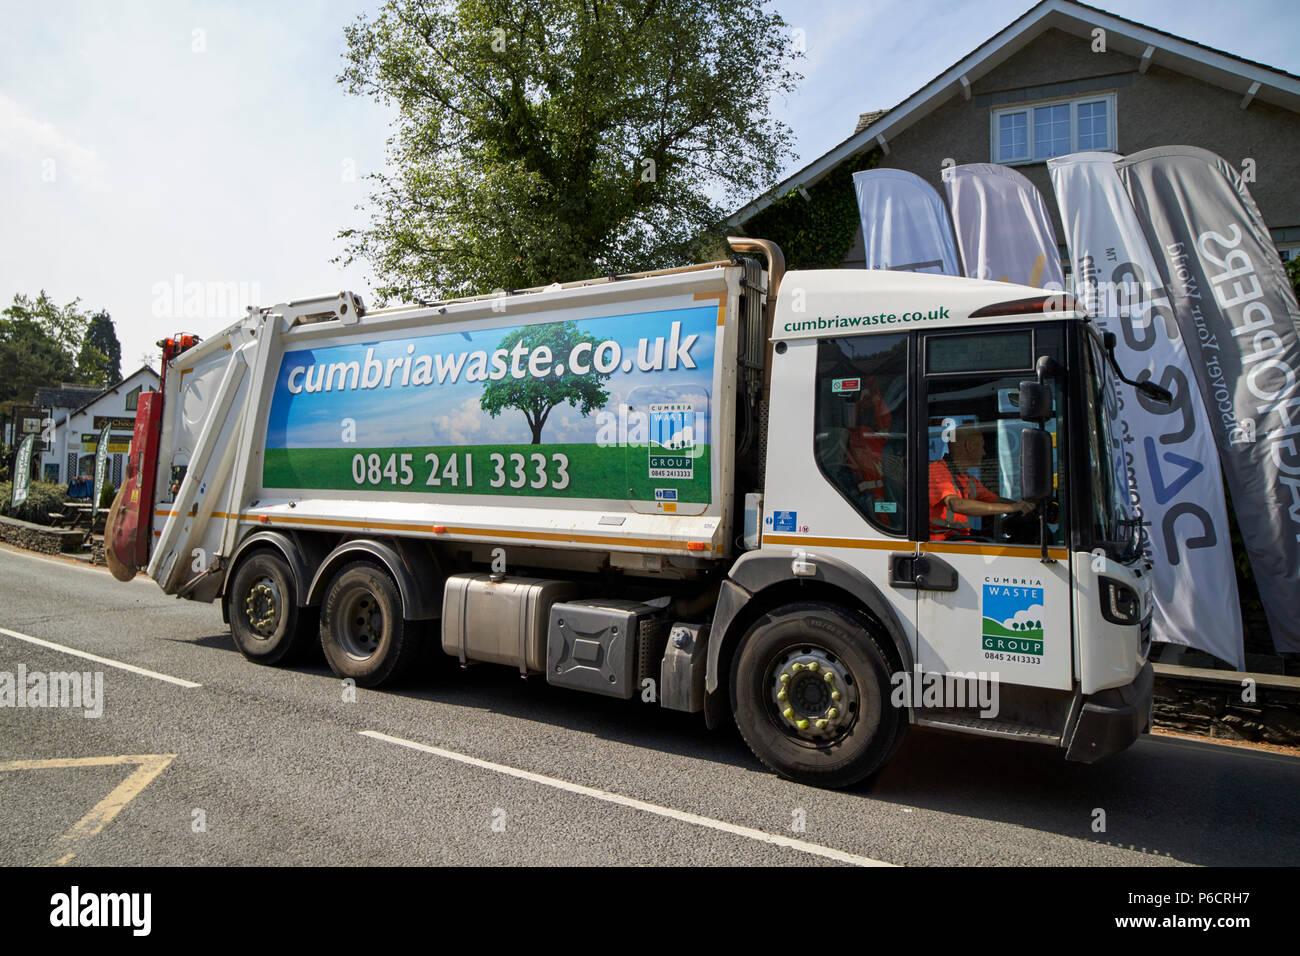 Déchets cumbria compagnie privée bin collection service à Grasmere cumbria lake district angleterre uk Photo Stock